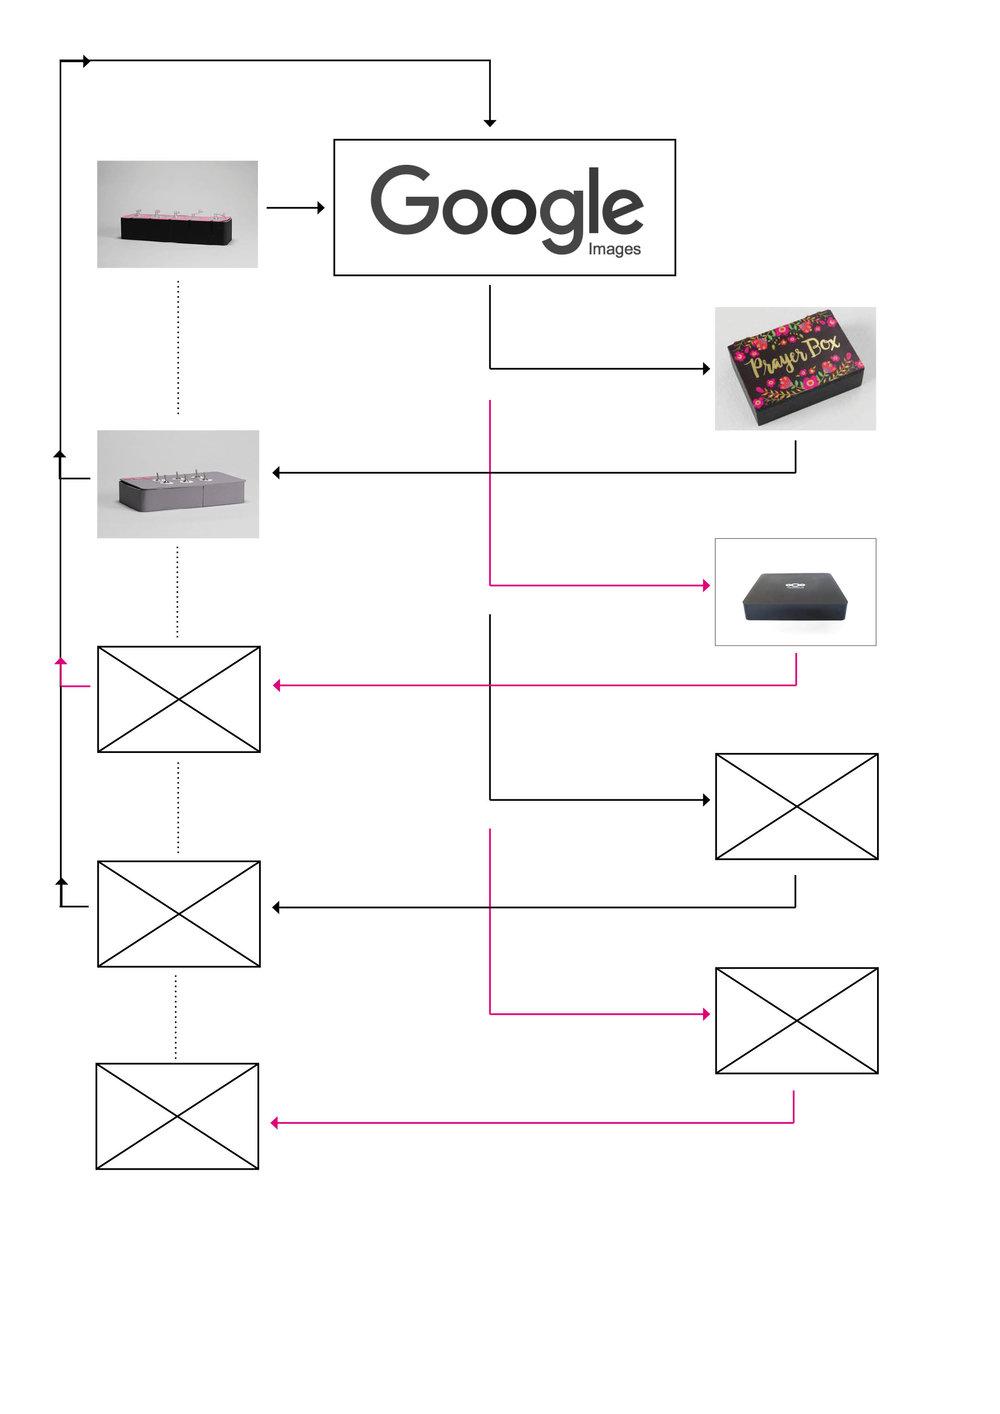 YouMayAlsoLike_diagram.jpg